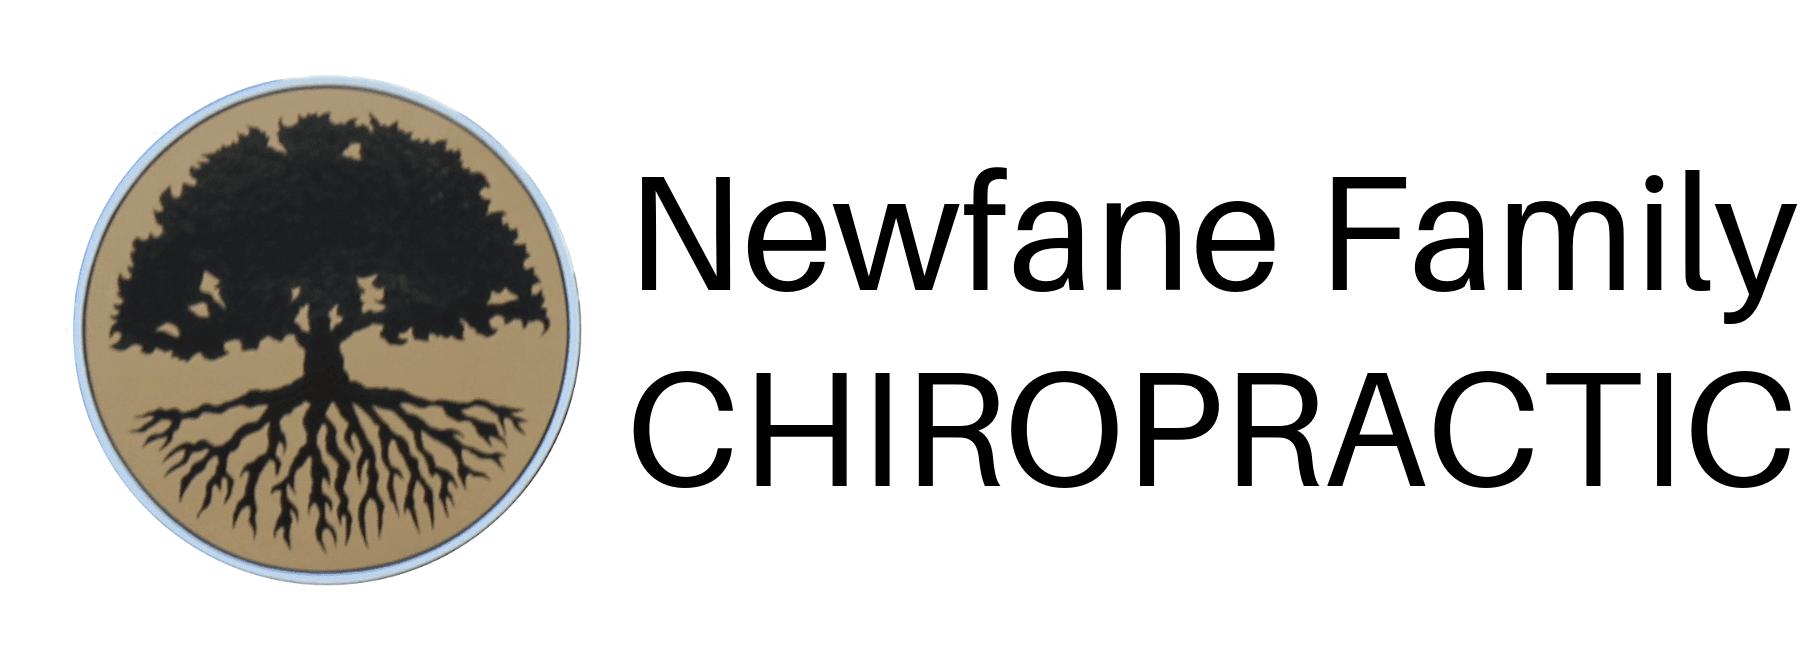 Newfane Family Chiropractic